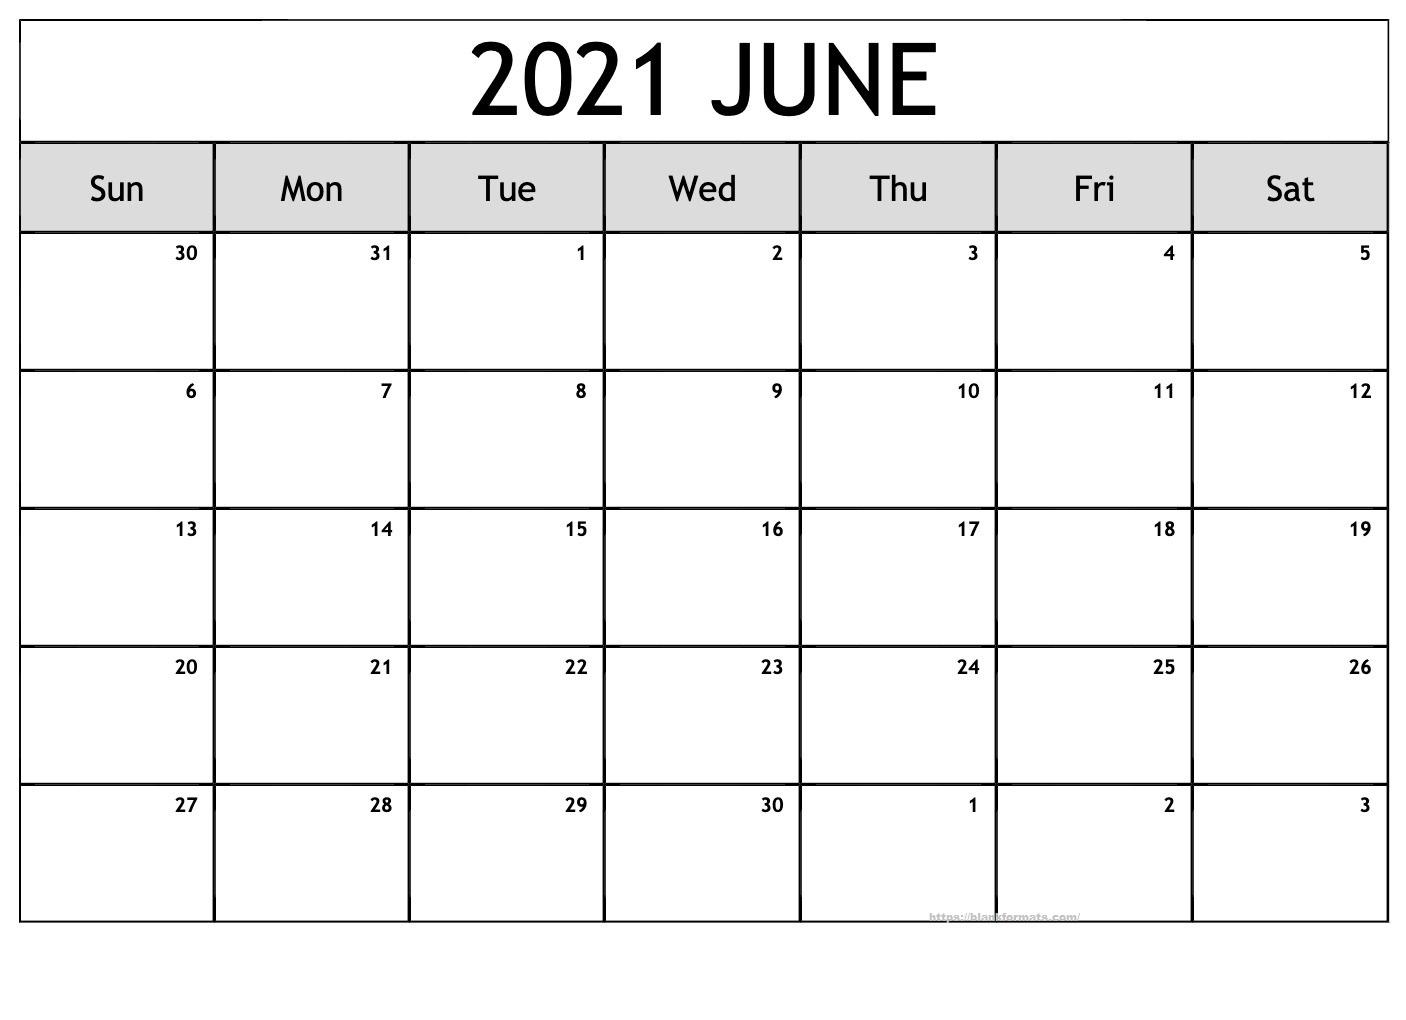 Blank June 2021 Calendar Pdf Download All Format June 2021 Calendar Blank